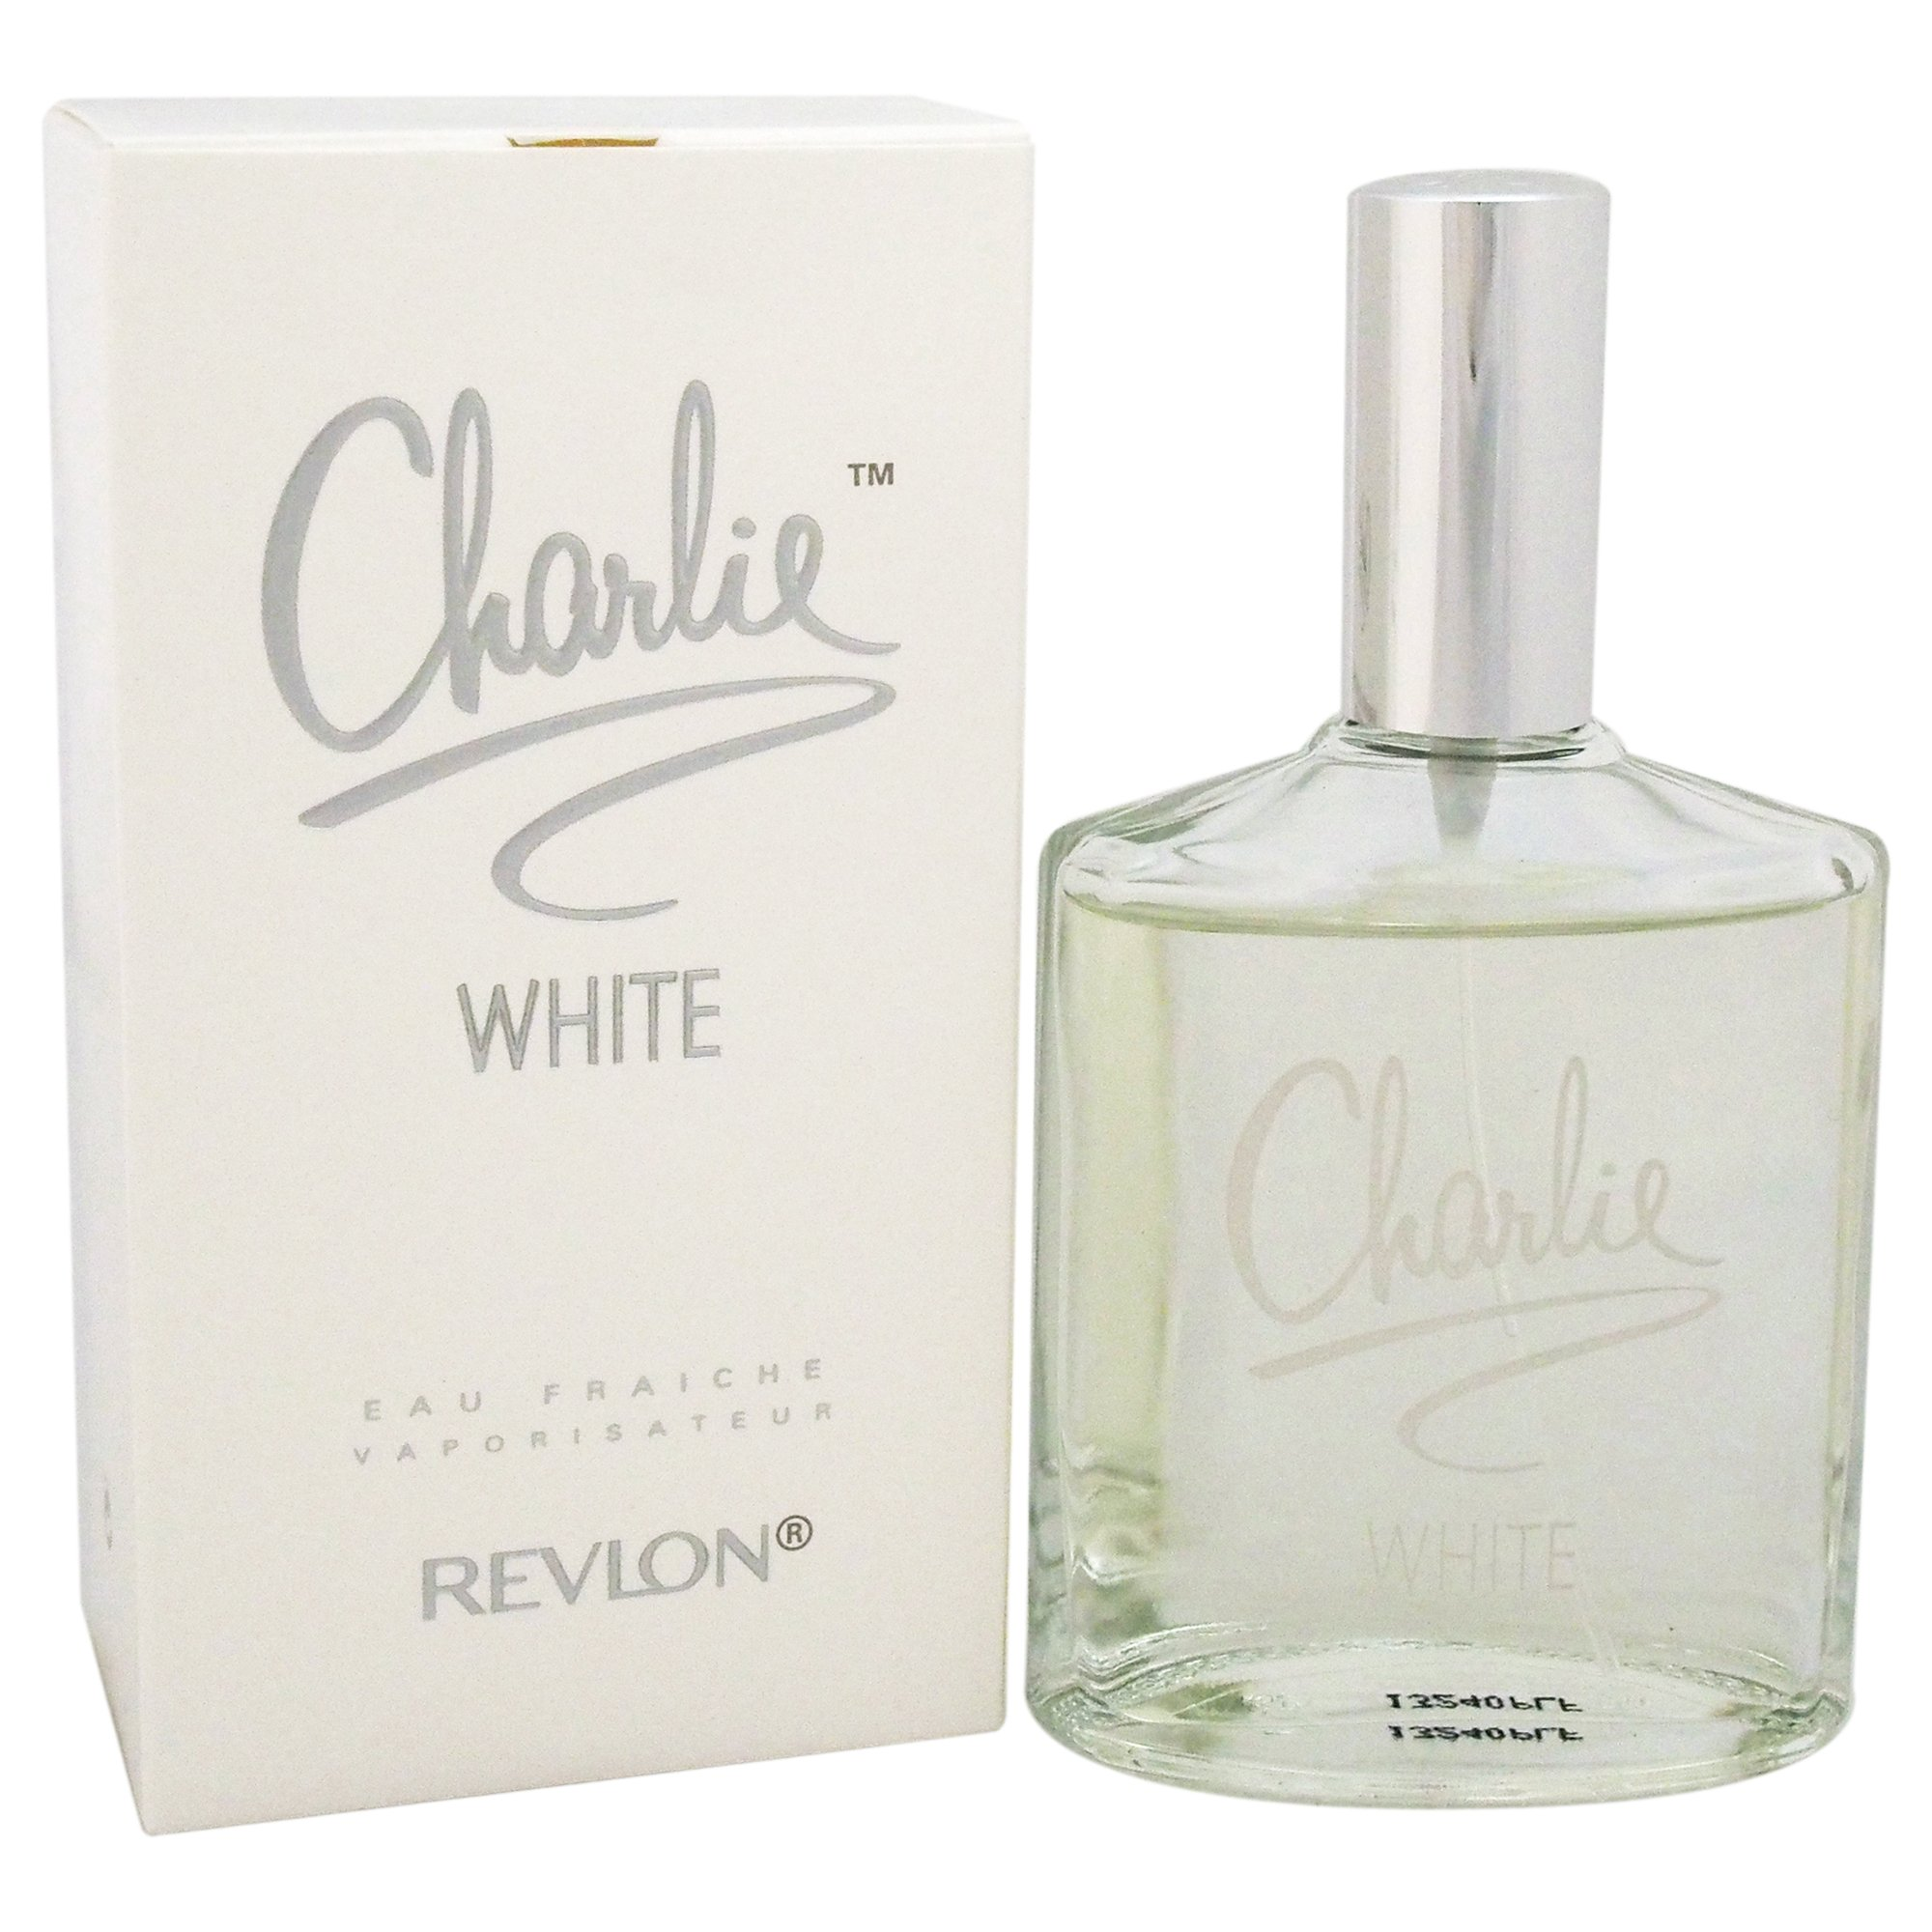 Charlie White by Revlon for Women - 3.4 Ounce Eau Fraiche Spray by Revlon